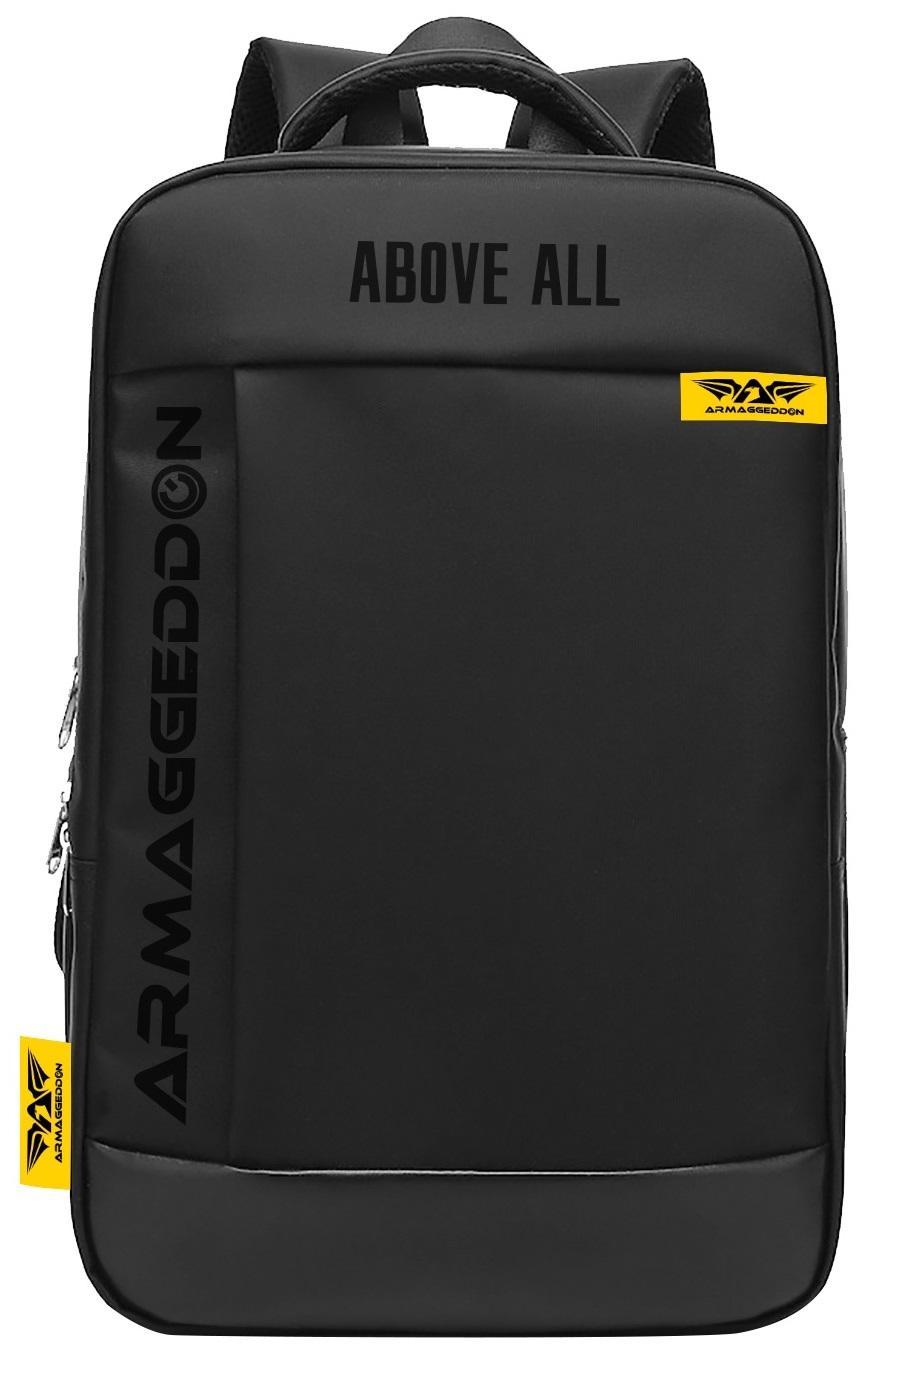 Armaggeddon SHIELD 7 Anti-Theft Gaming Bag Black